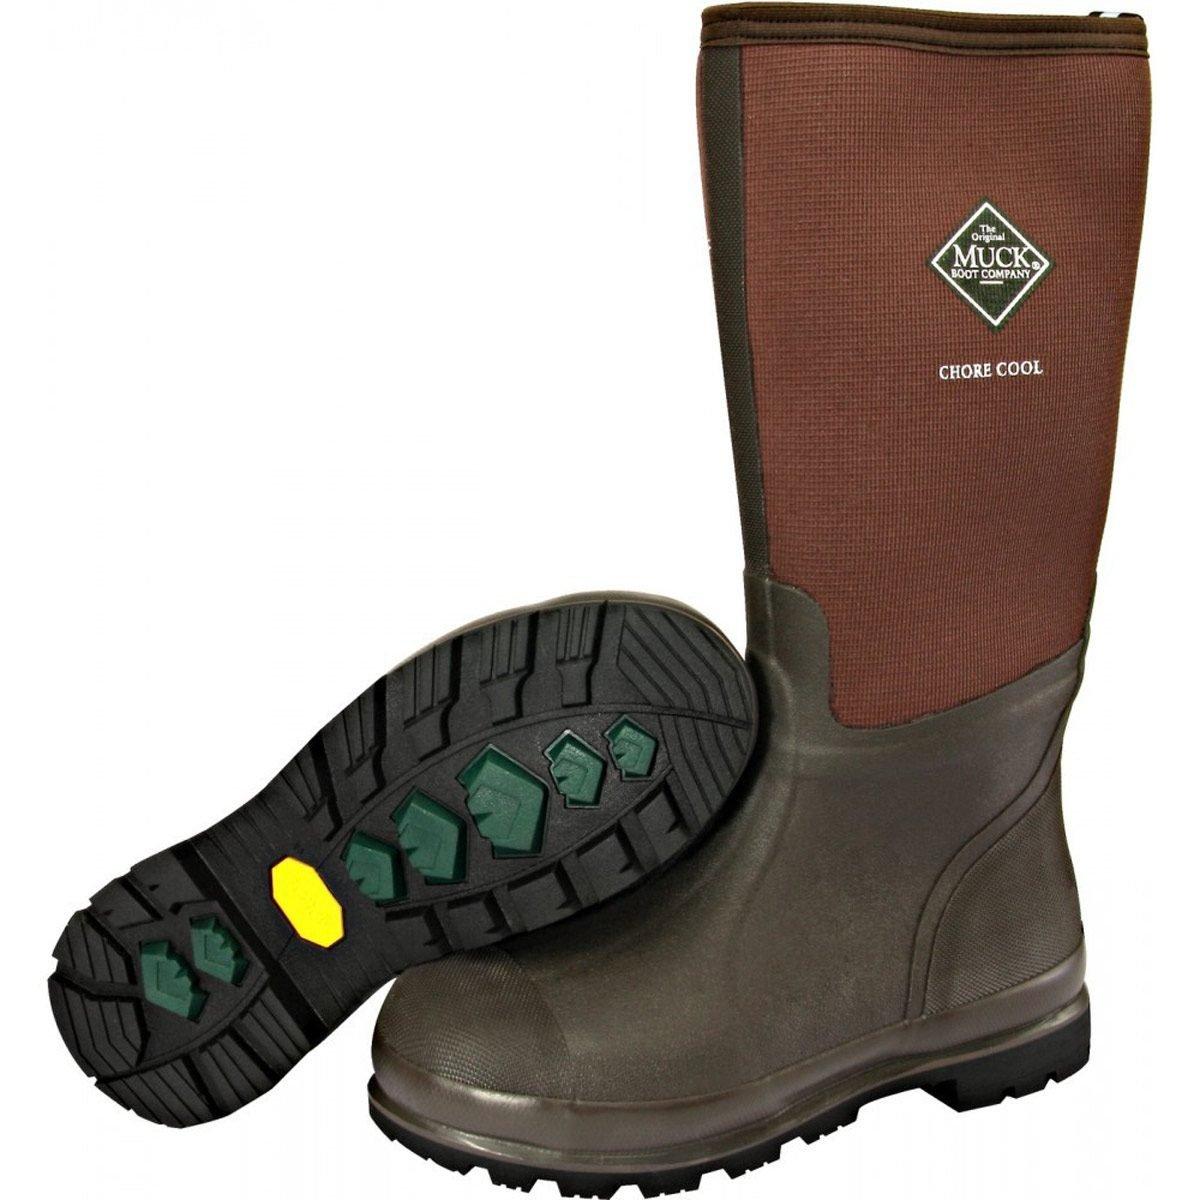 safety grisport mens work image comfortable comforter high quality boot boots boulder